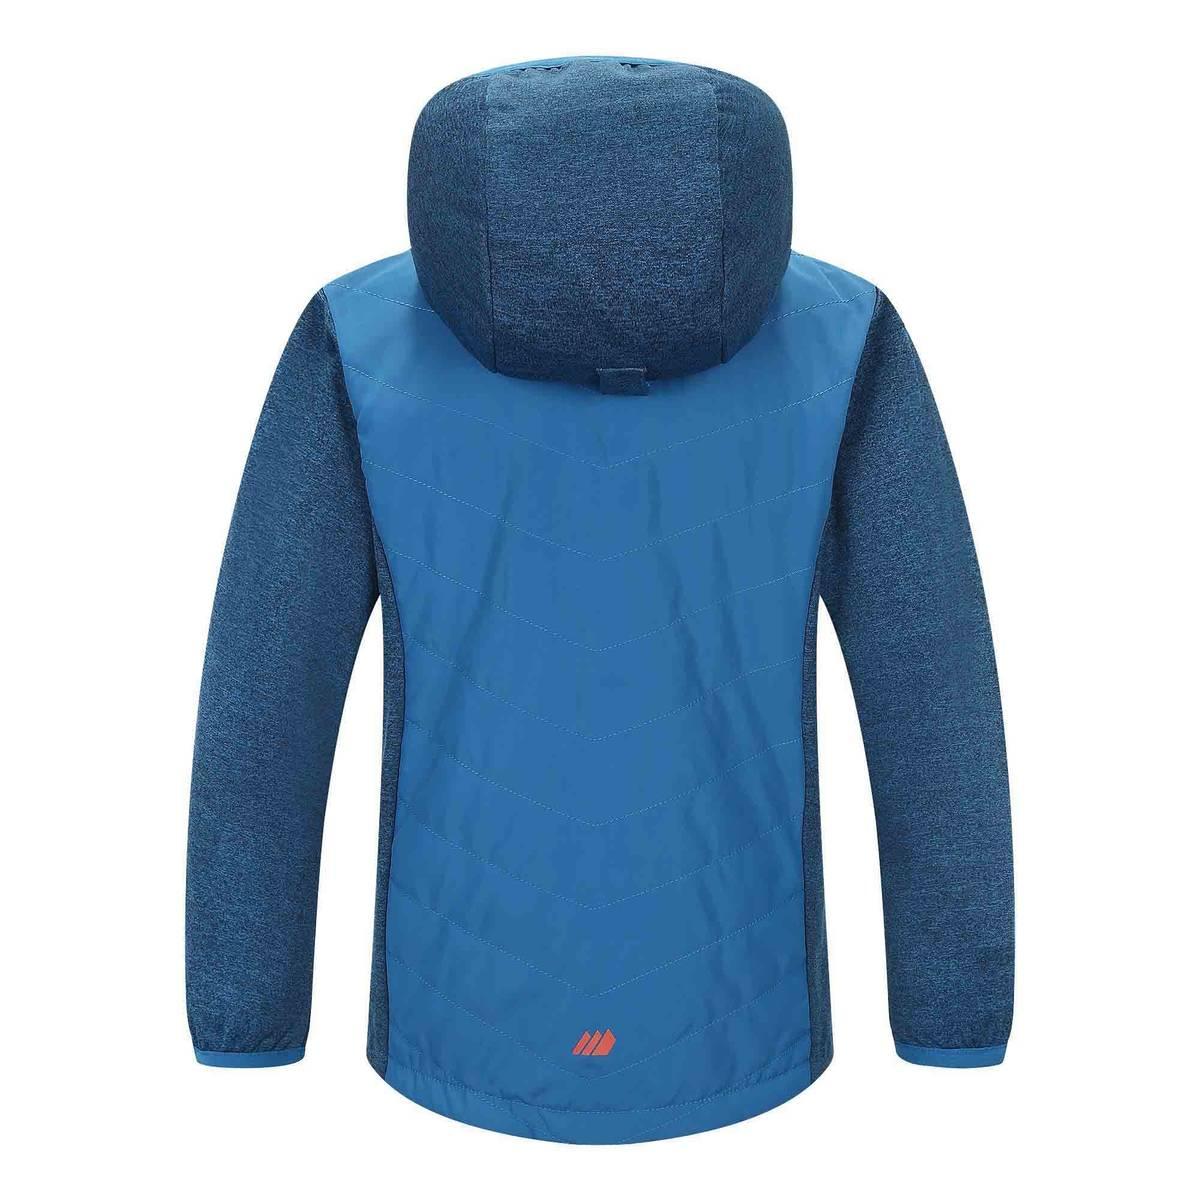 Nea hybrid jakke til jente - Blue sapphire